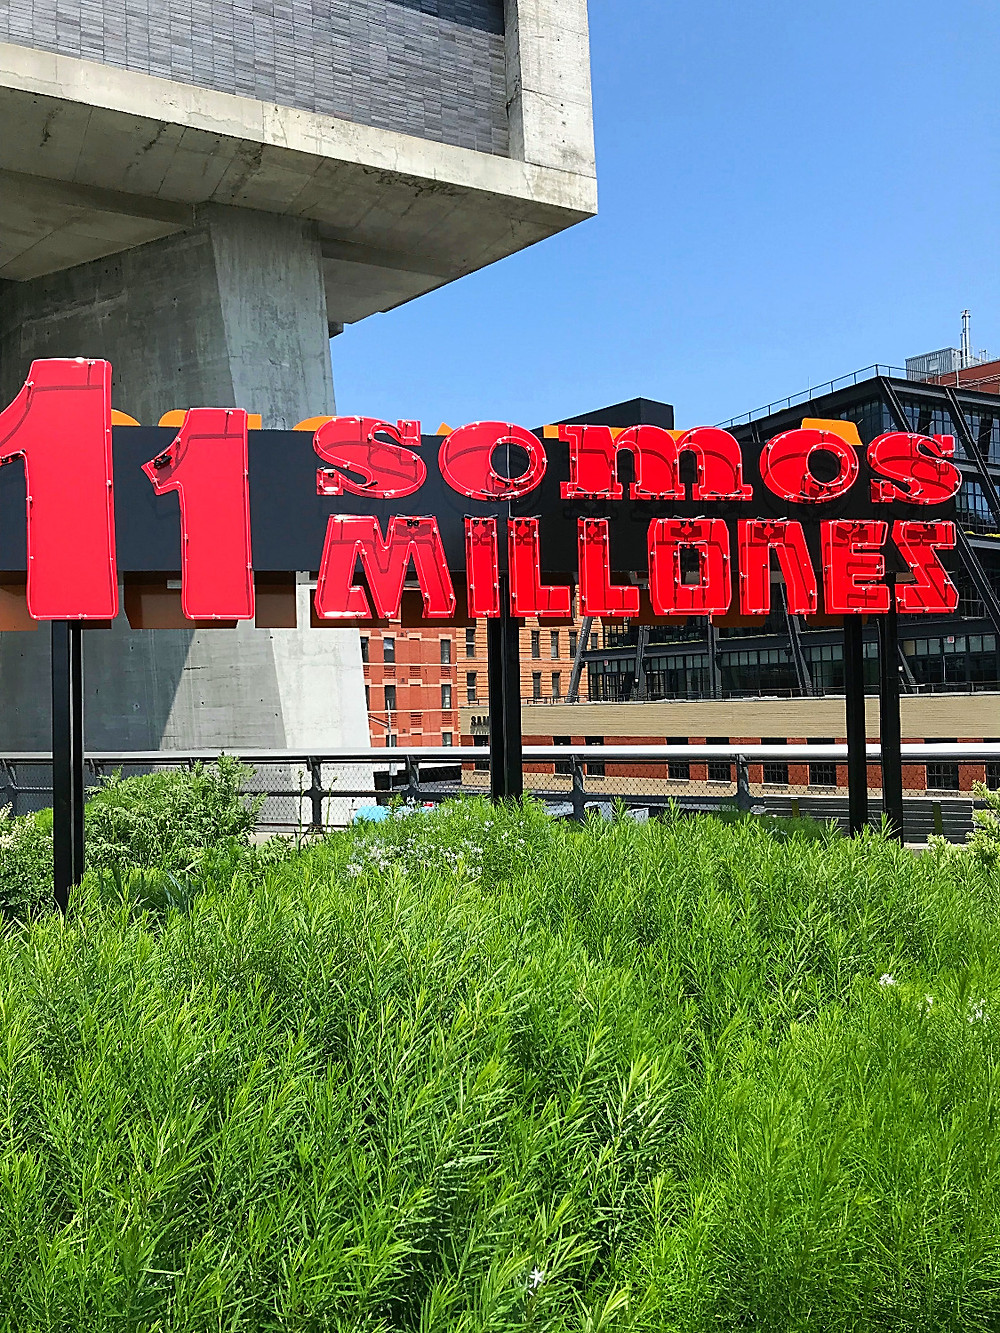 High Line, public art, DREAMERS, nyc art, nyc summer, nyc kids